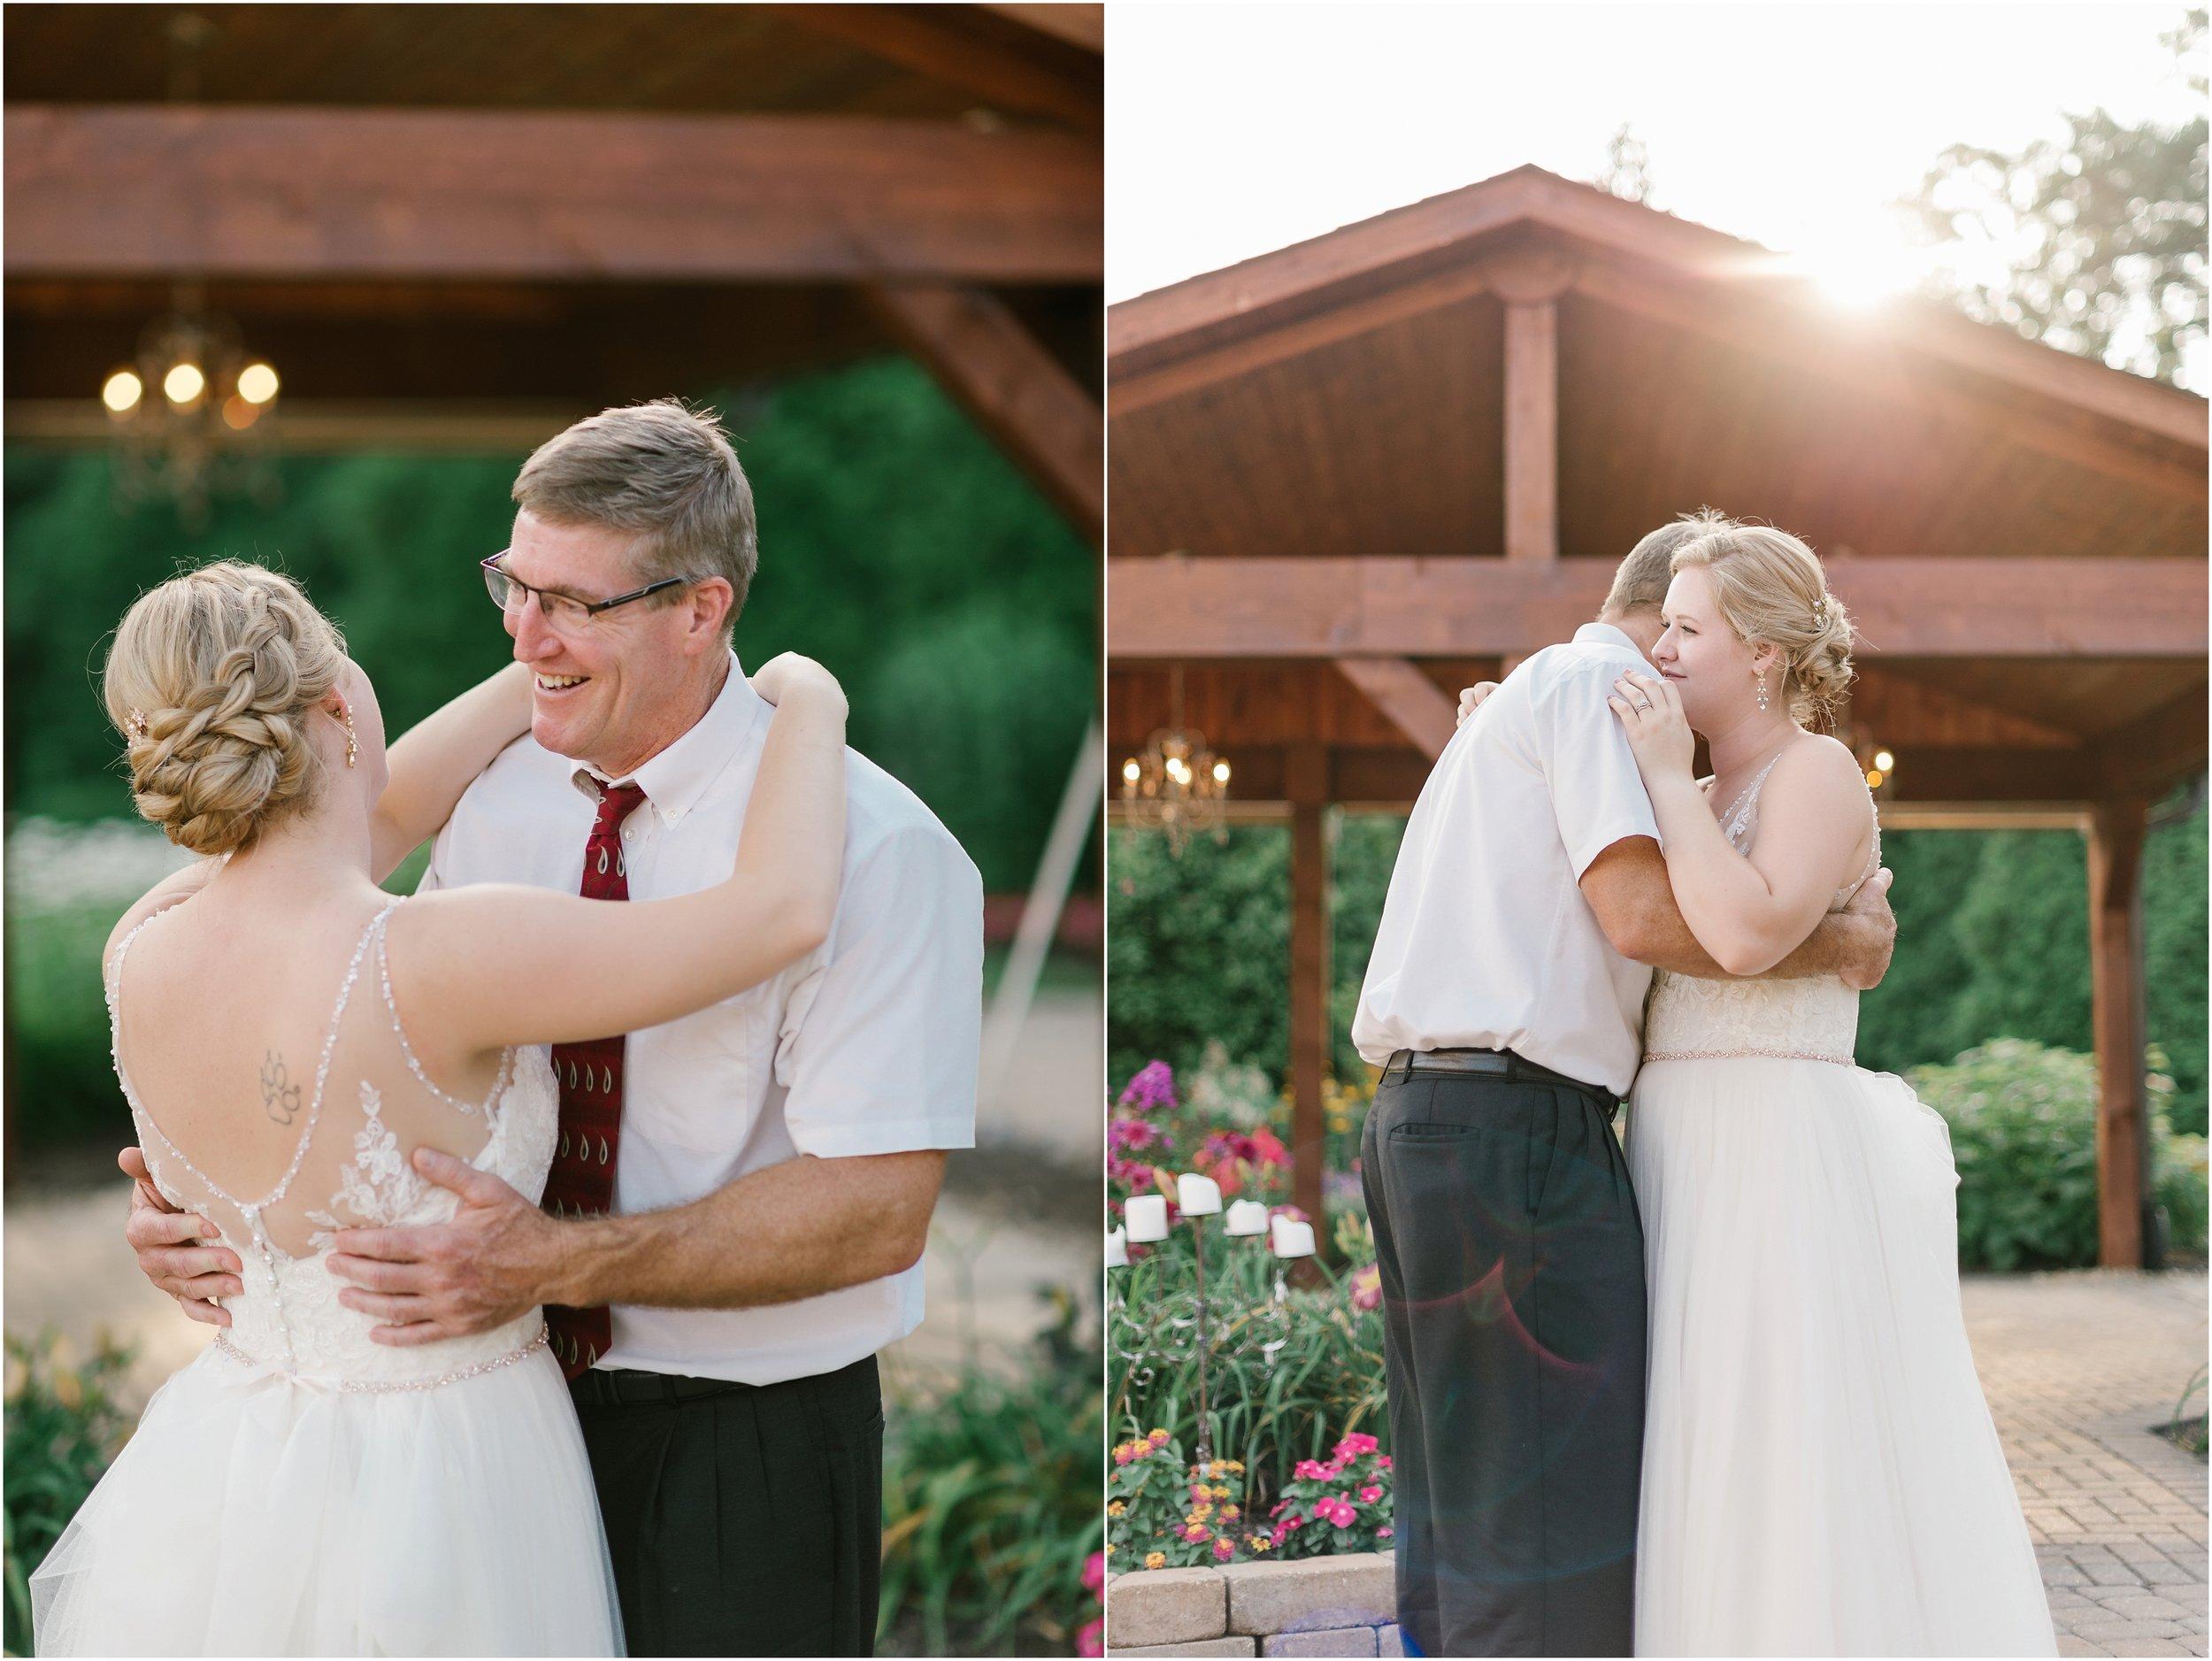 Rebecca_Shehorn_Photography_Indianapolis_Wedding_Photographer_8517.jpg